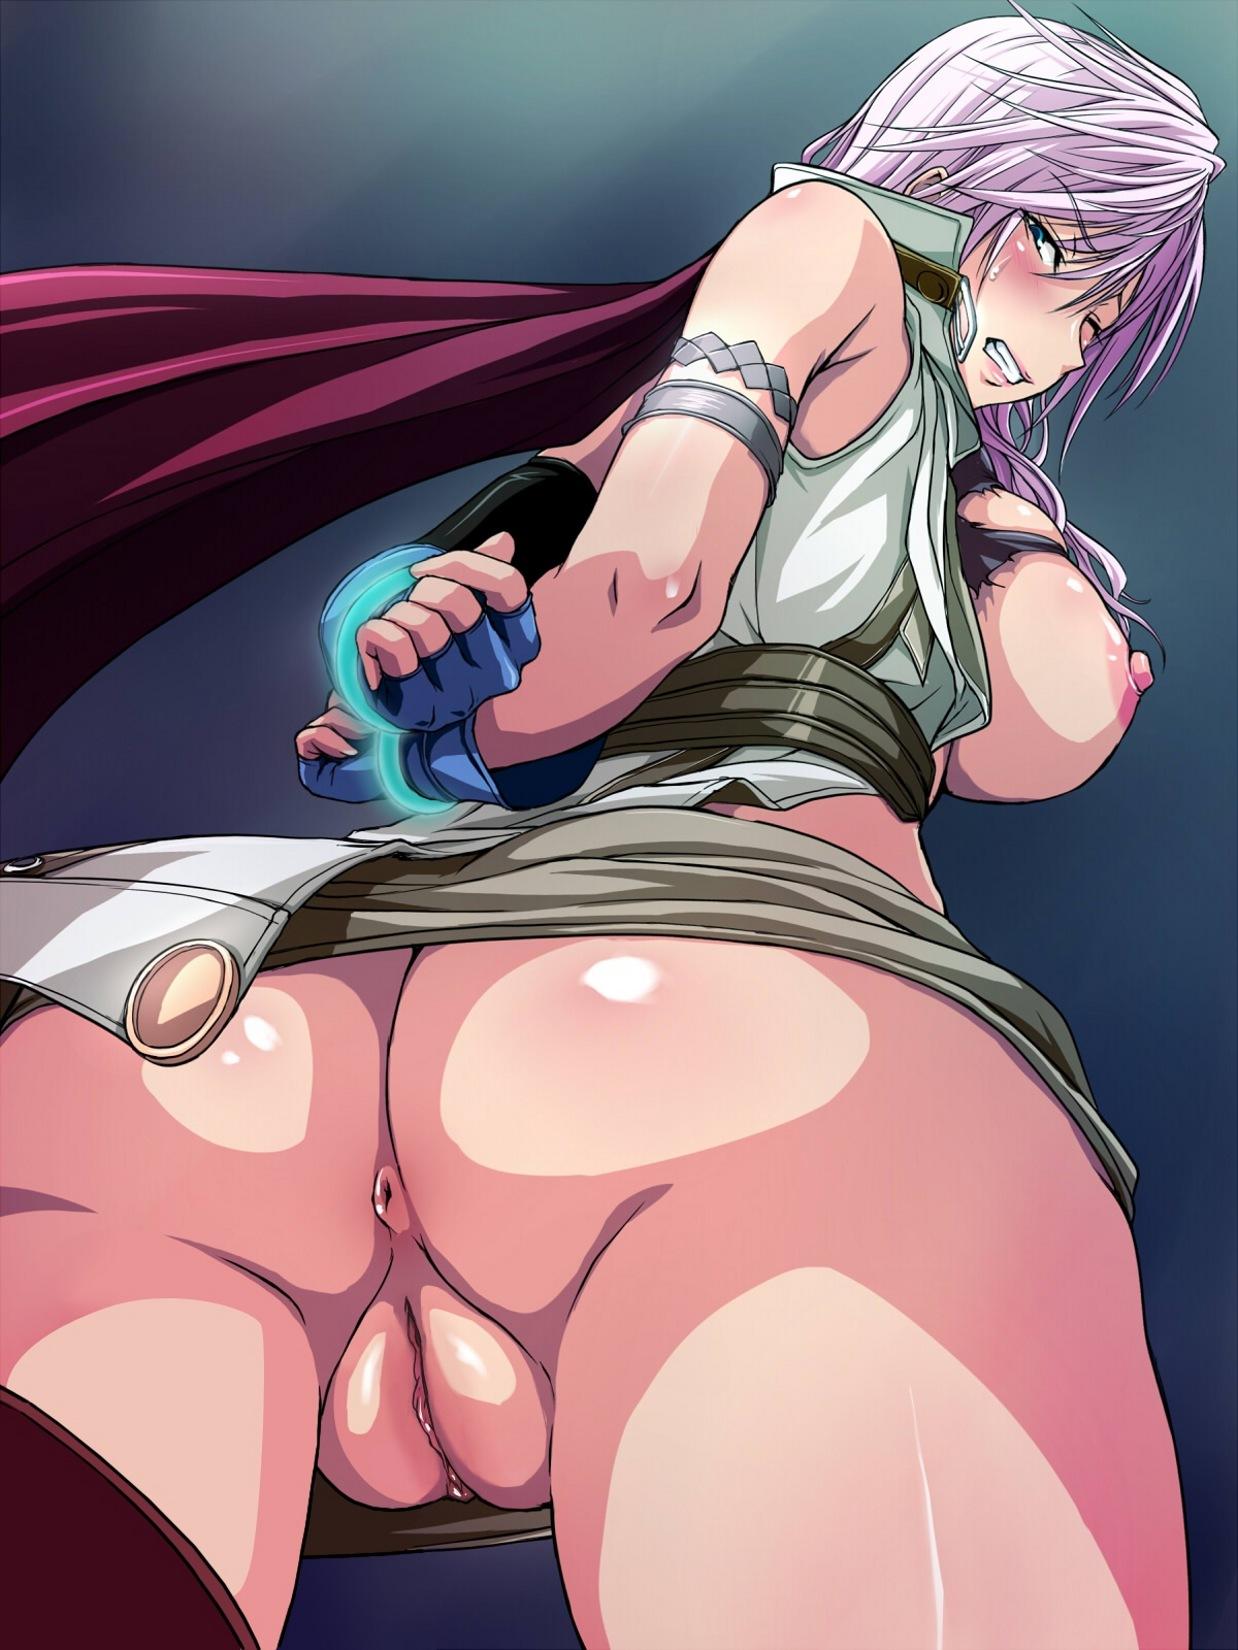 Final fantasy hentai cosplays